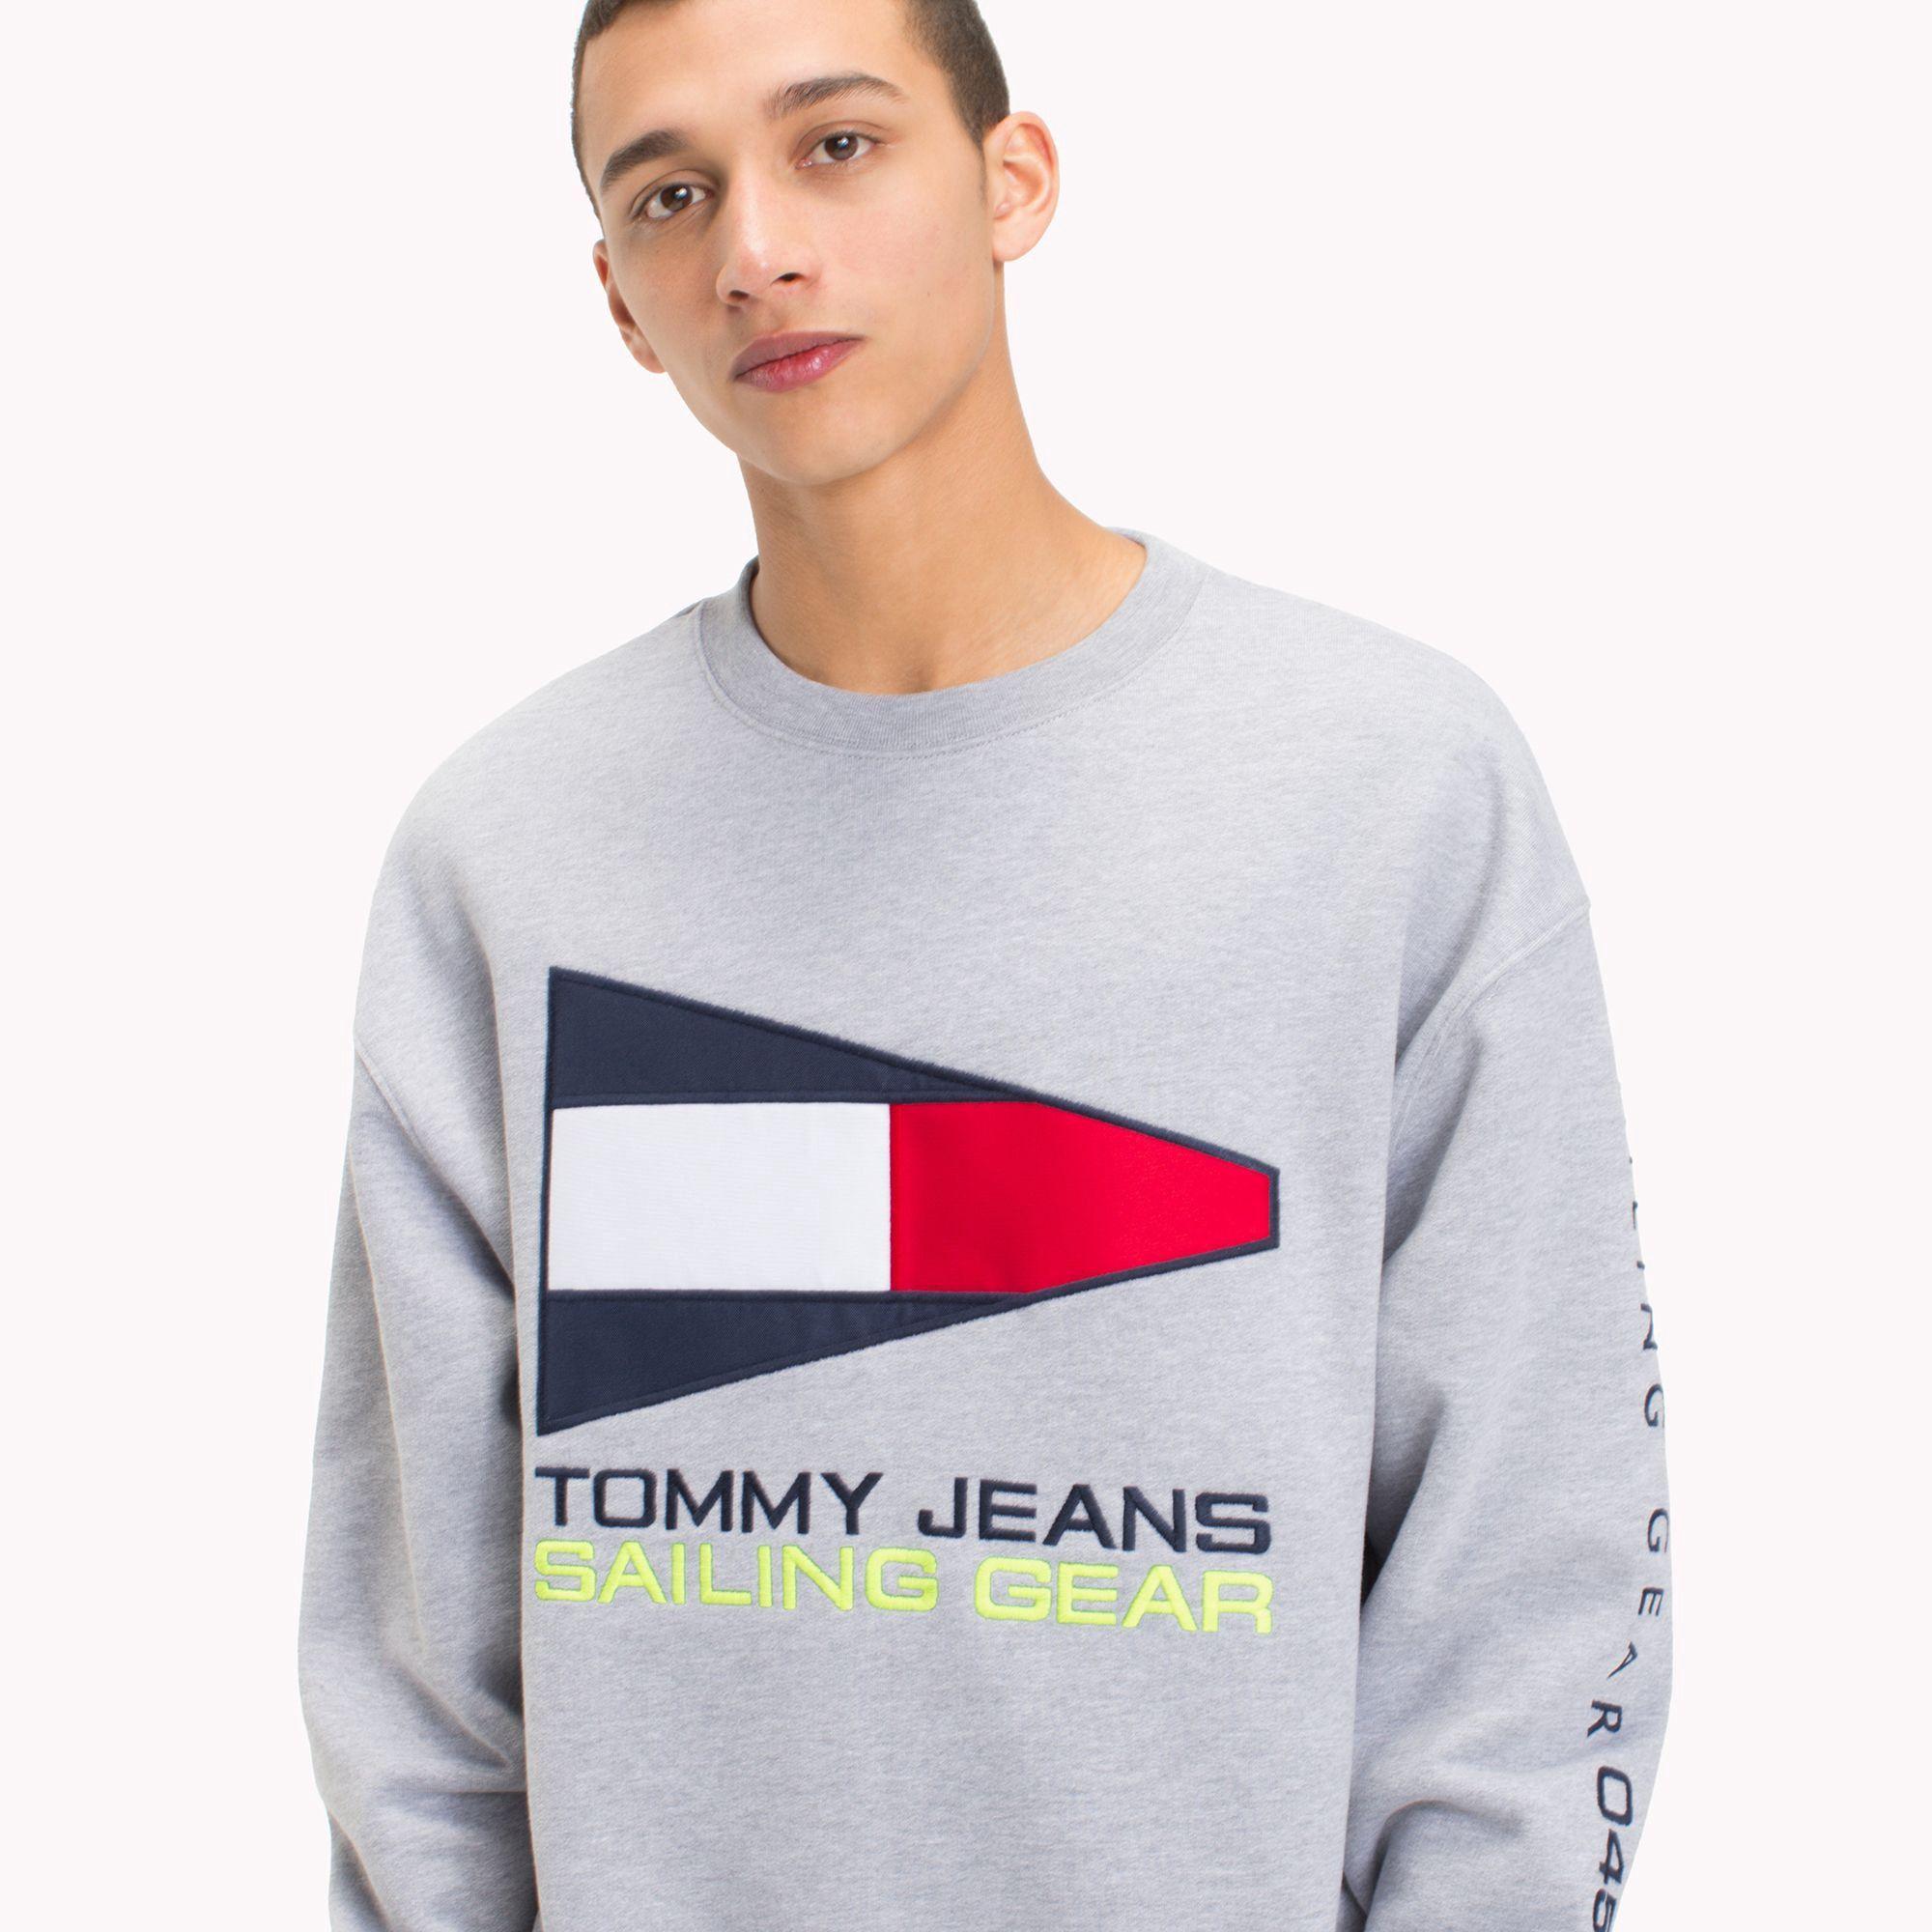 51ce44485100 Tommy Hilfiger Capsule Collection Sailing Sweatshirt - XXL